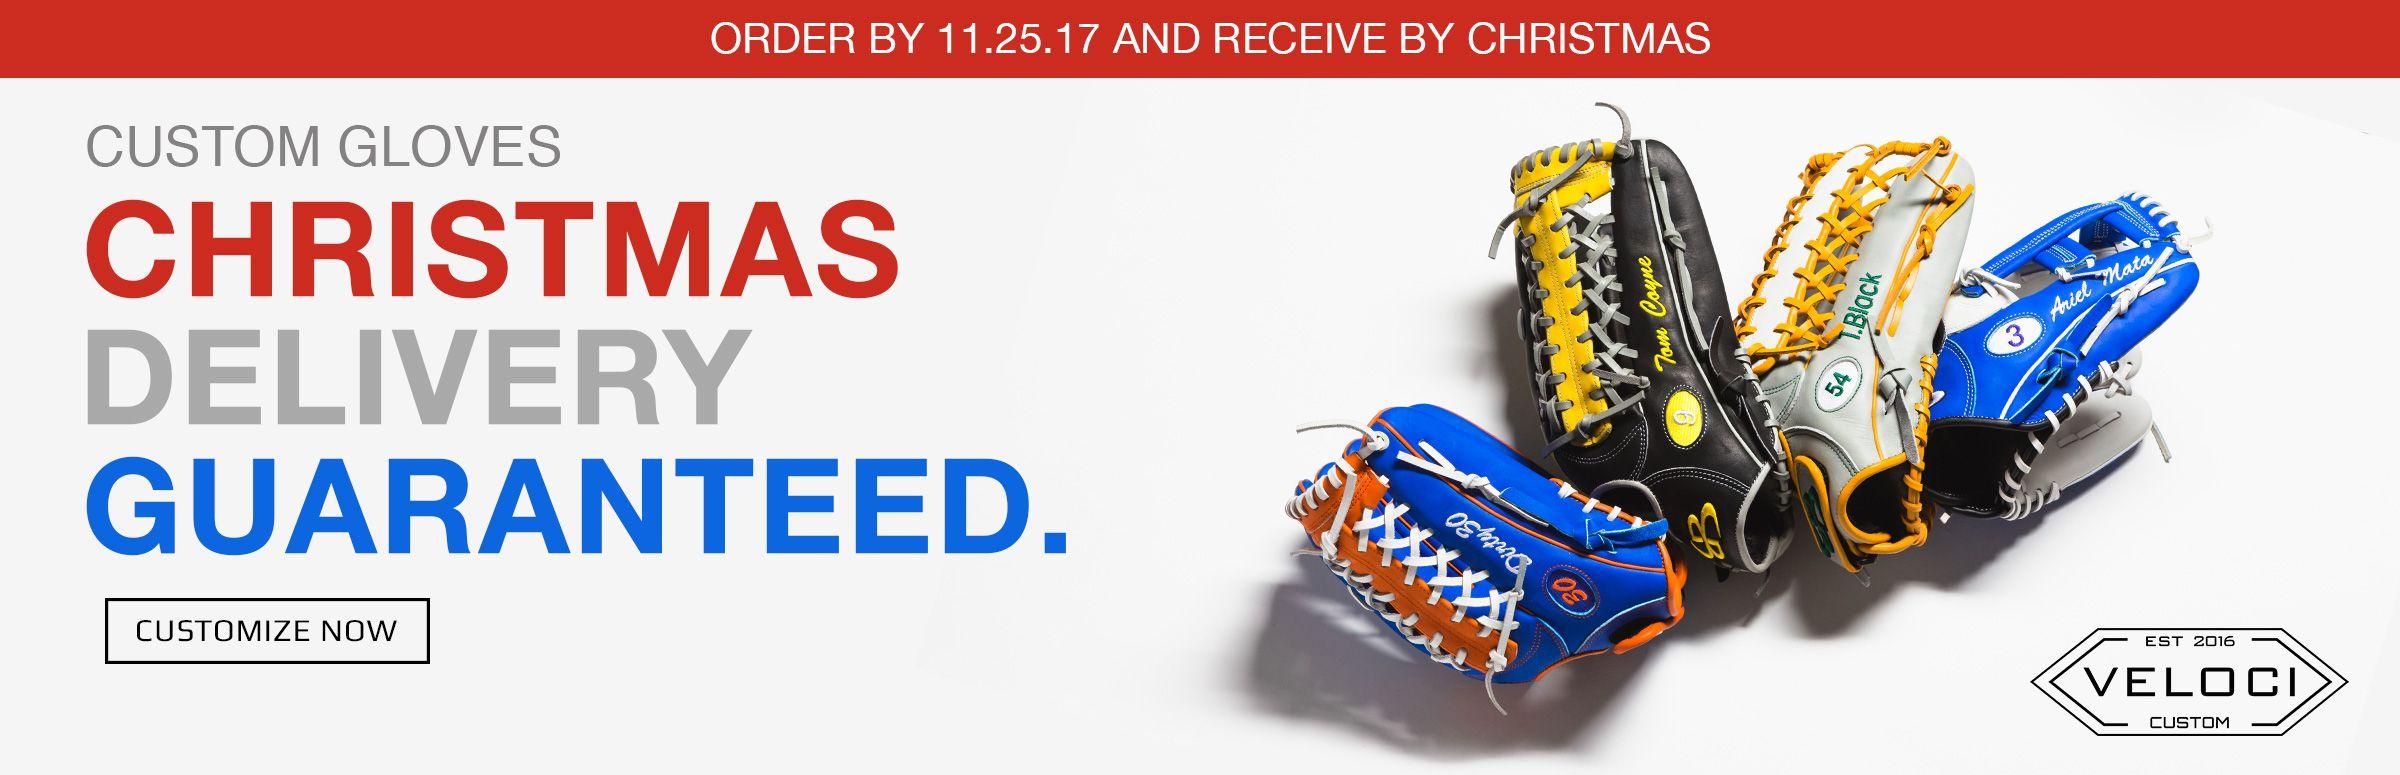 Custom Gloves By Christmas